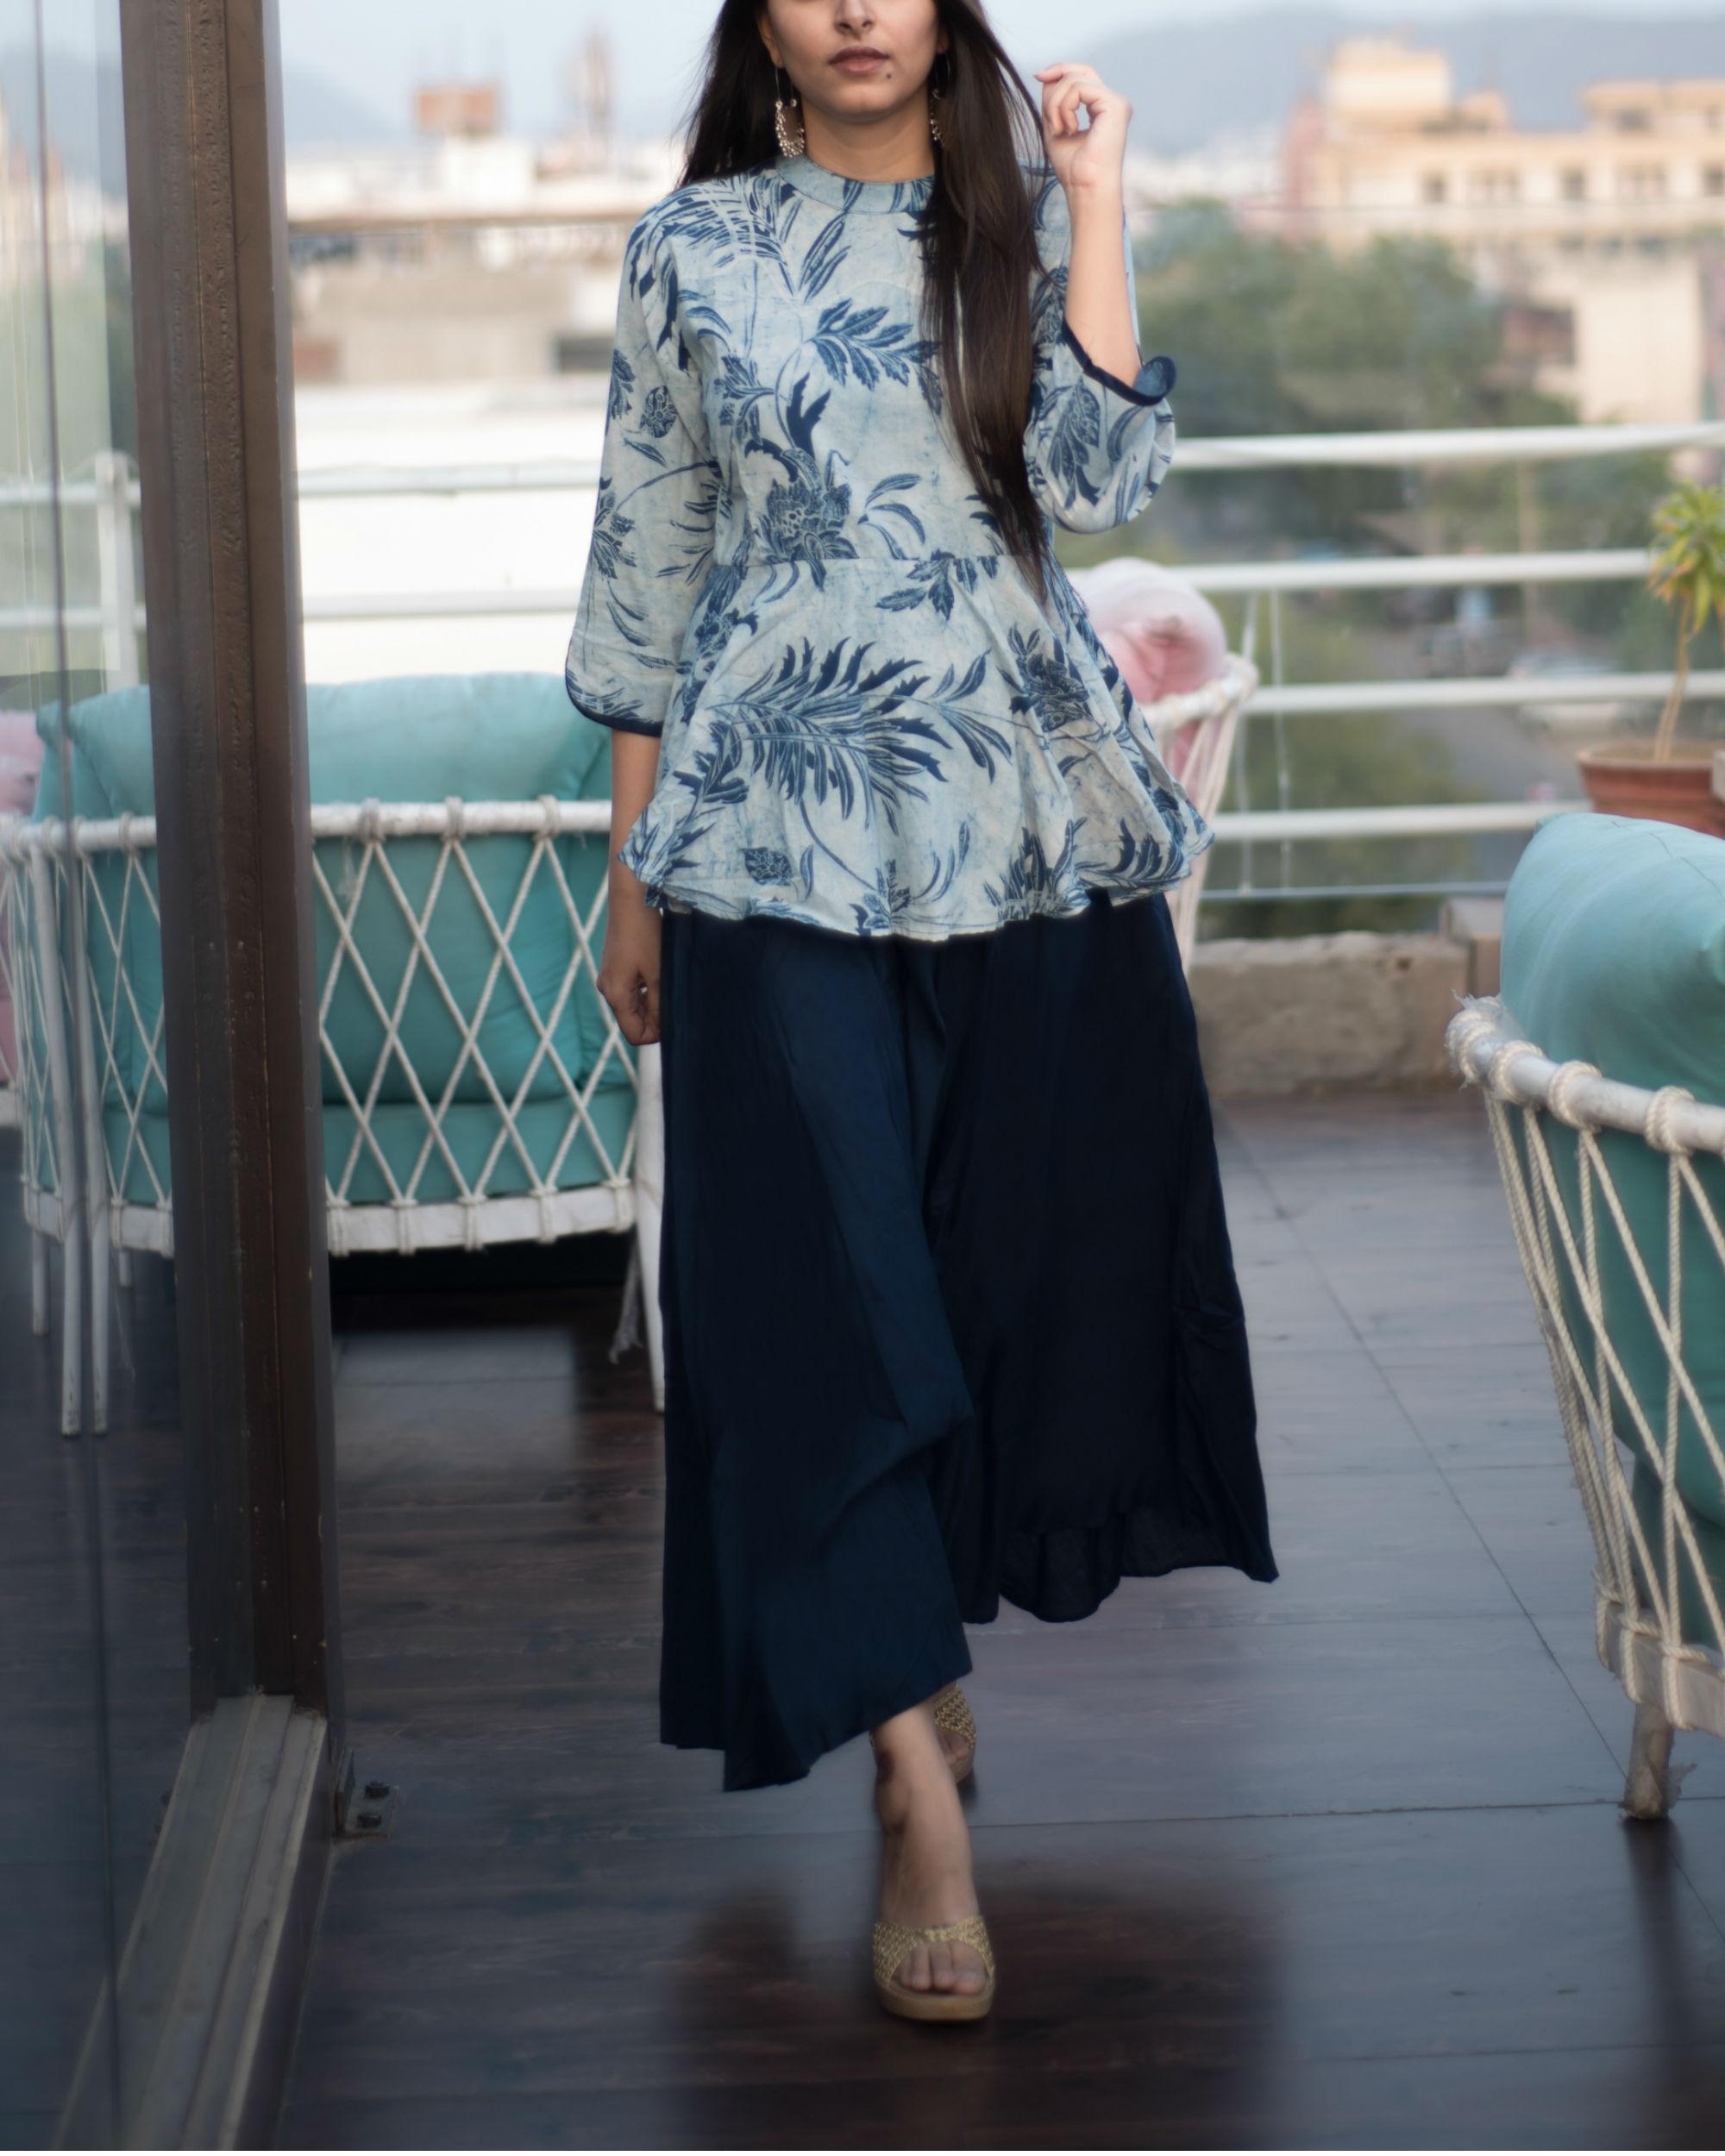 fbdbbe935387e Indigo blue peplum dress by Label Harsha Khatry